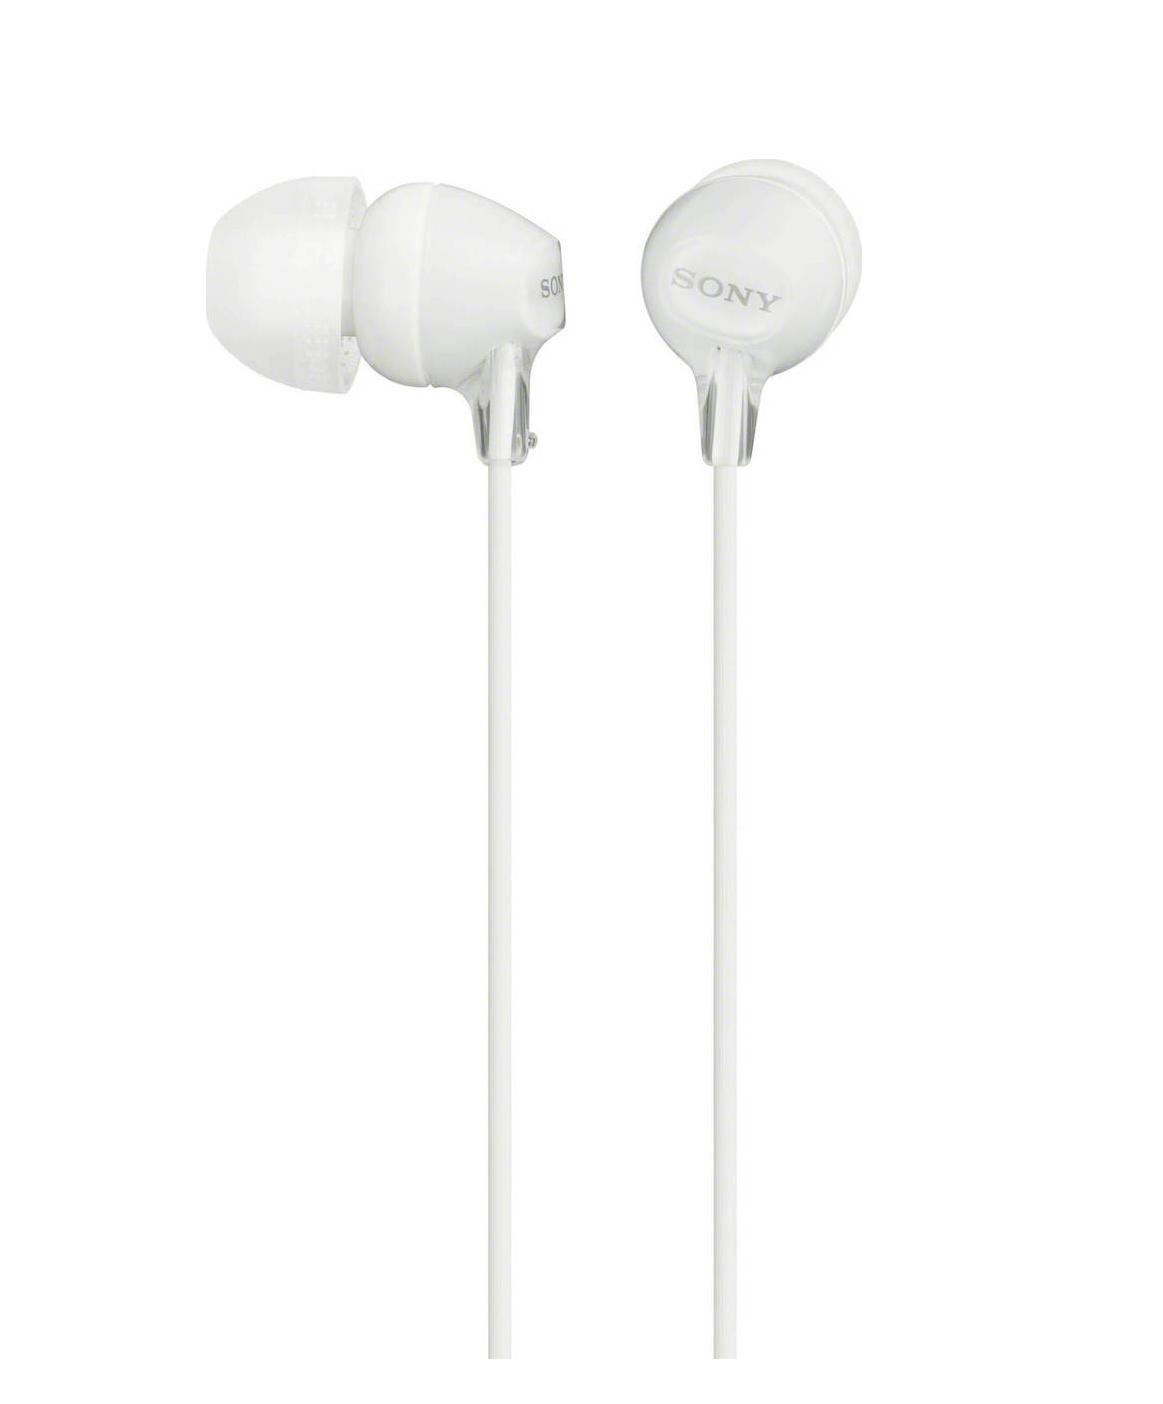 Sony MDR-EX15LPW In-Ear Headphones White